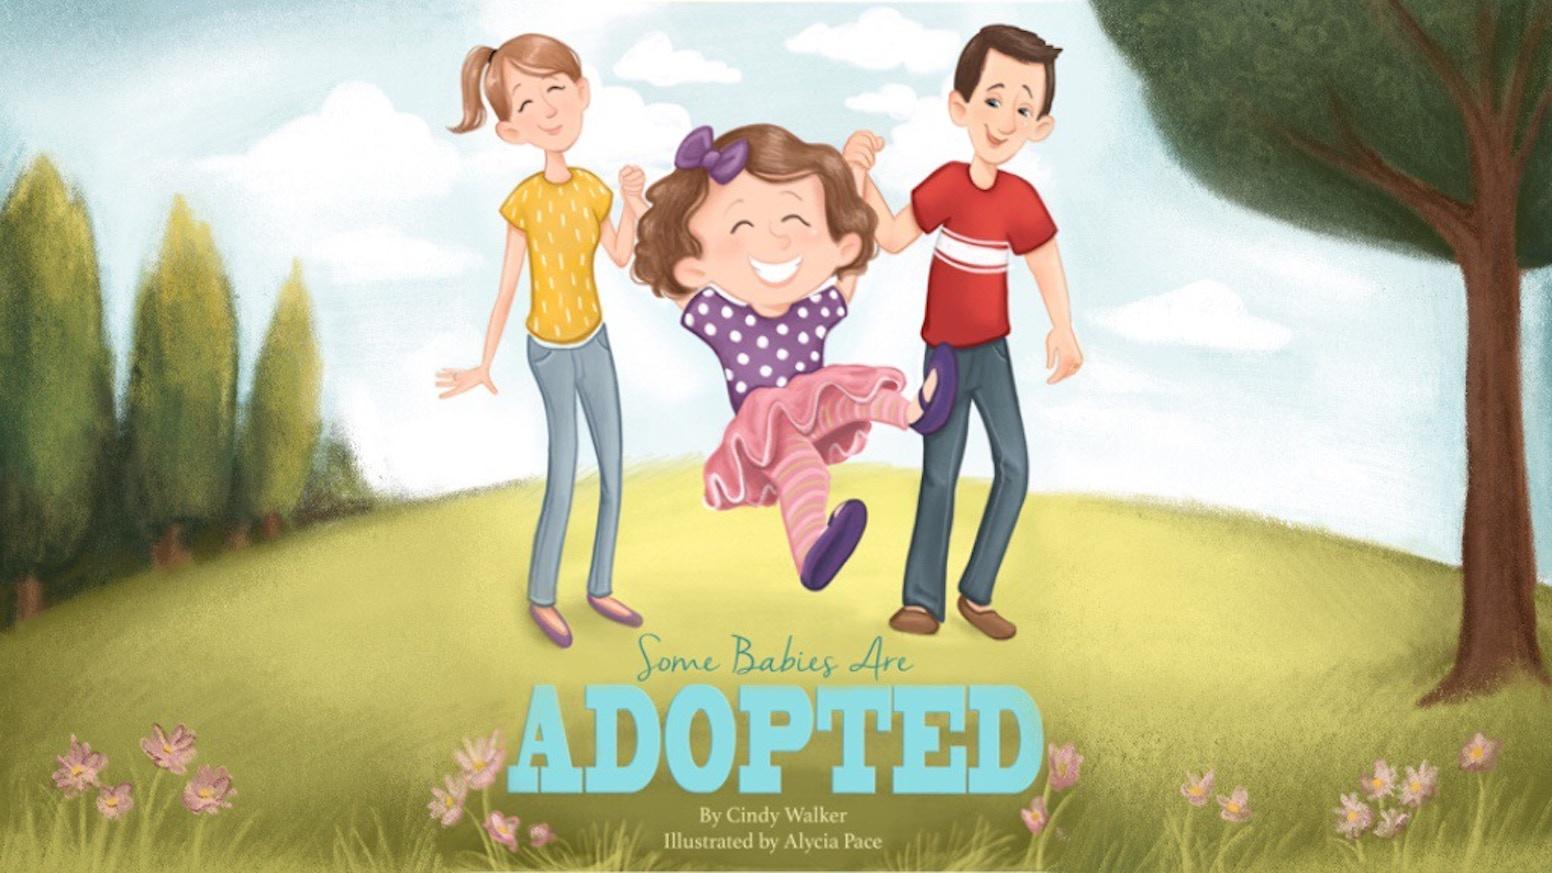 A Children's Book About Adoption